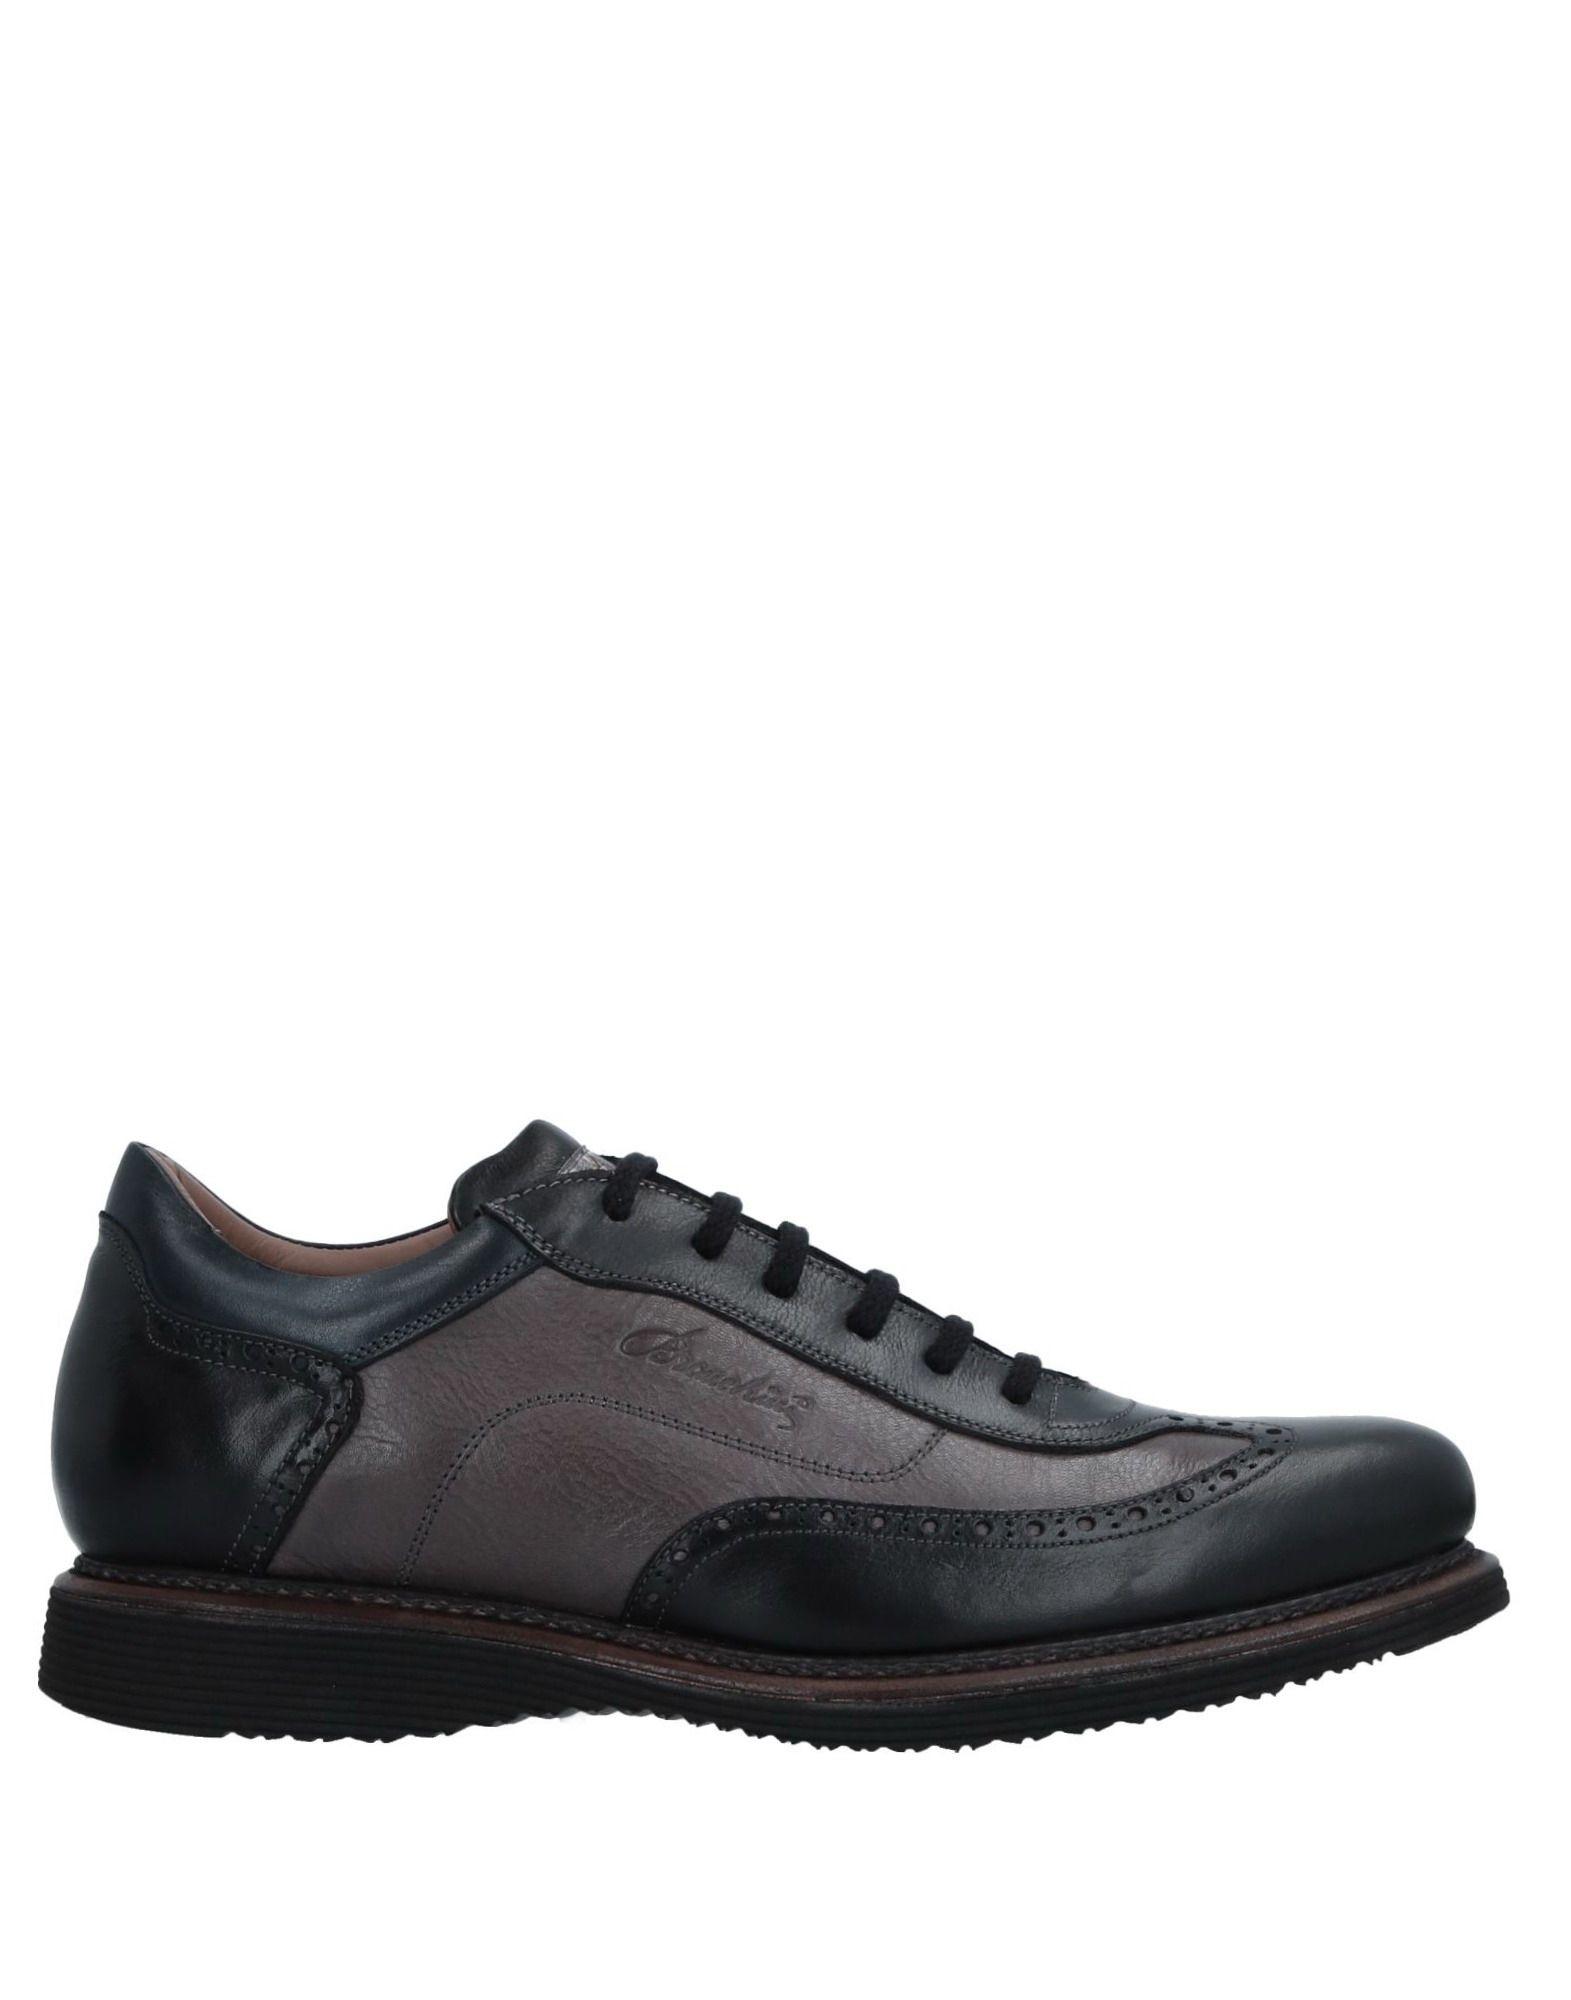 Sneakers Trofeo By Stefano Branchini Uomo - 11521472VS